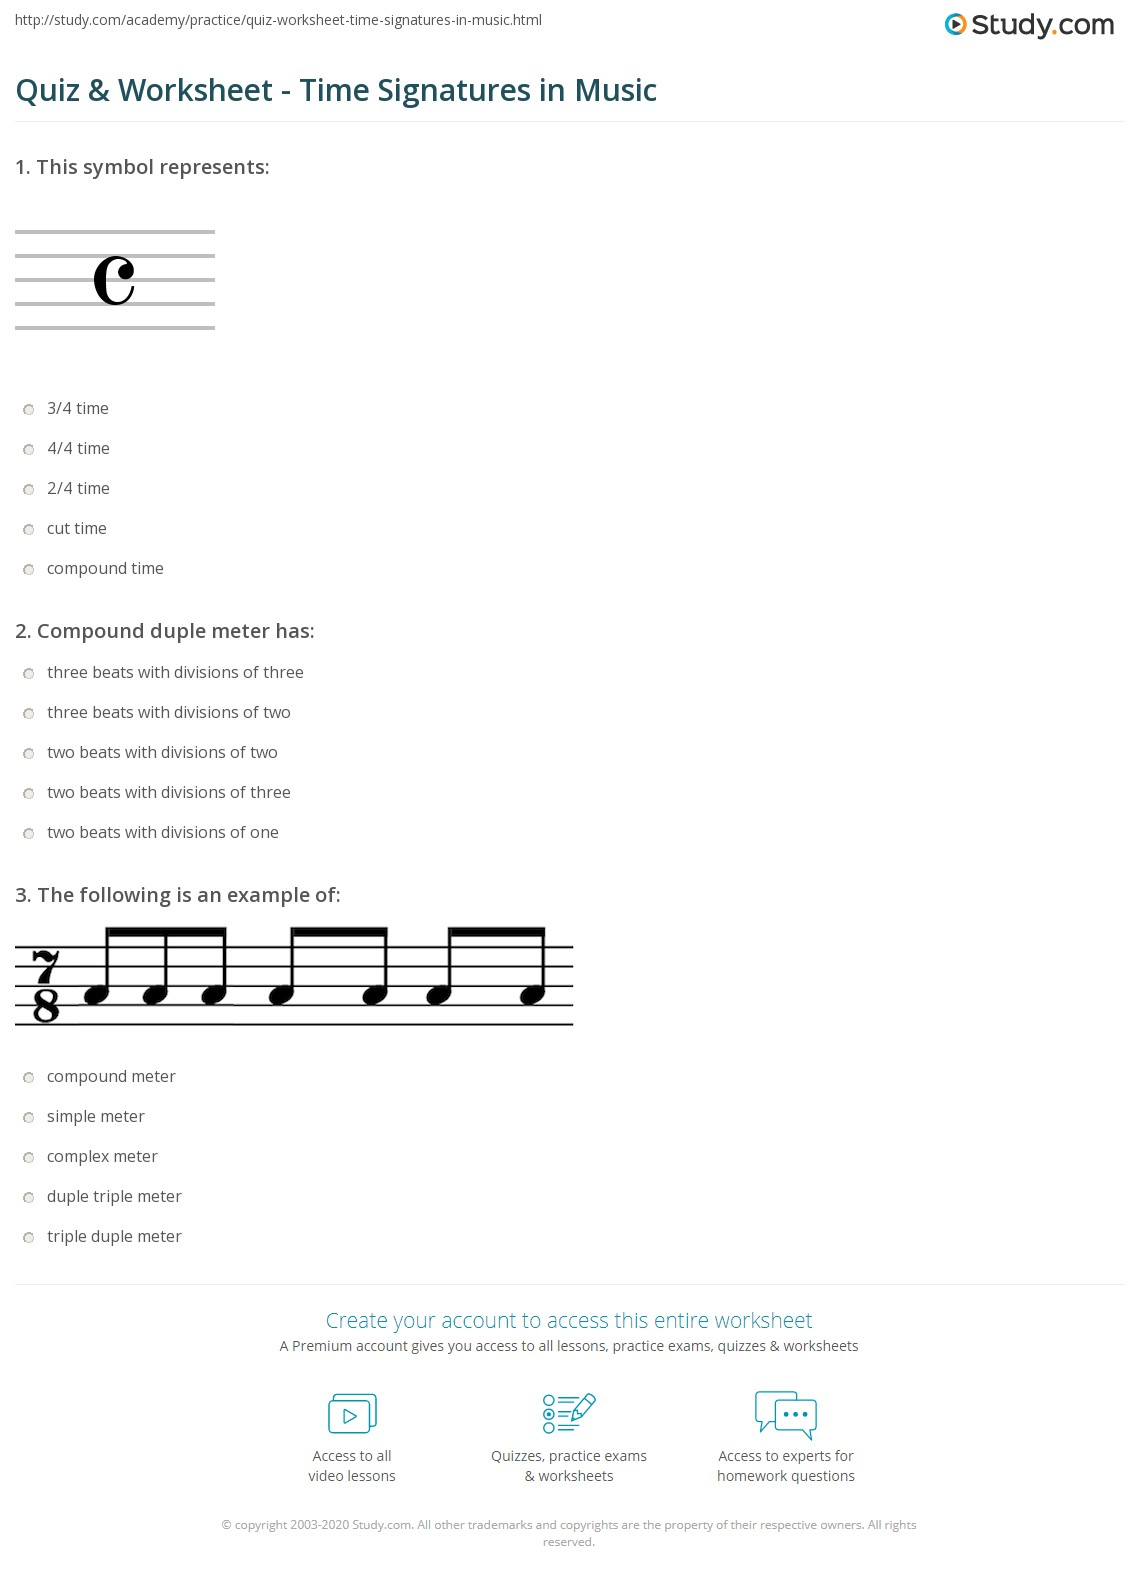 Quiz & Worksheet - Time Signatures in Music | Study.com